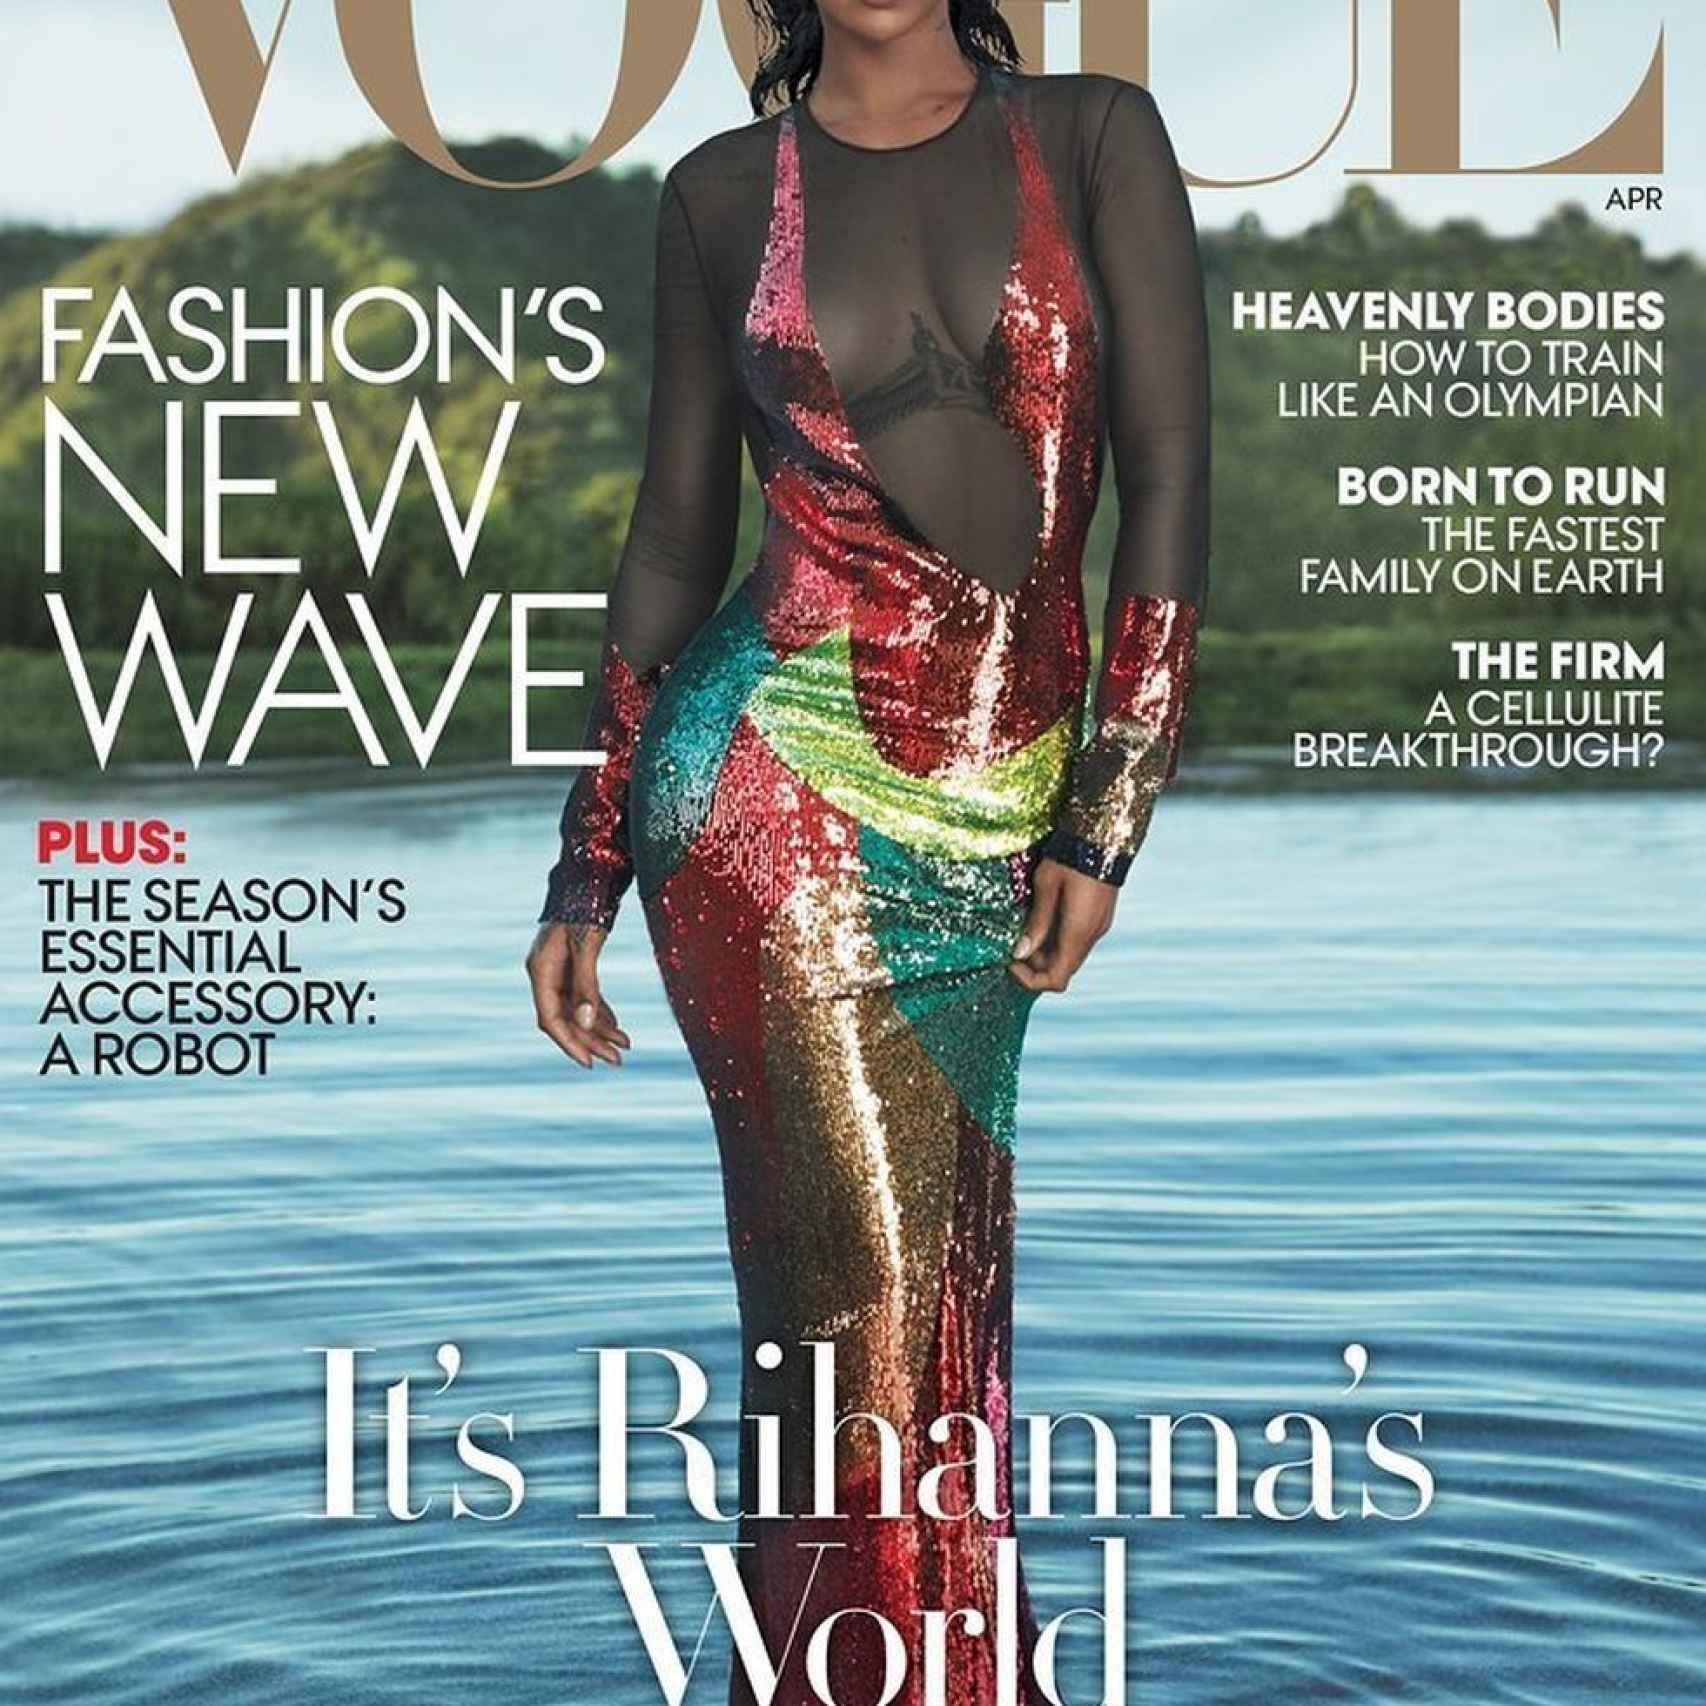 Rihanna en la portada de Vogue abril